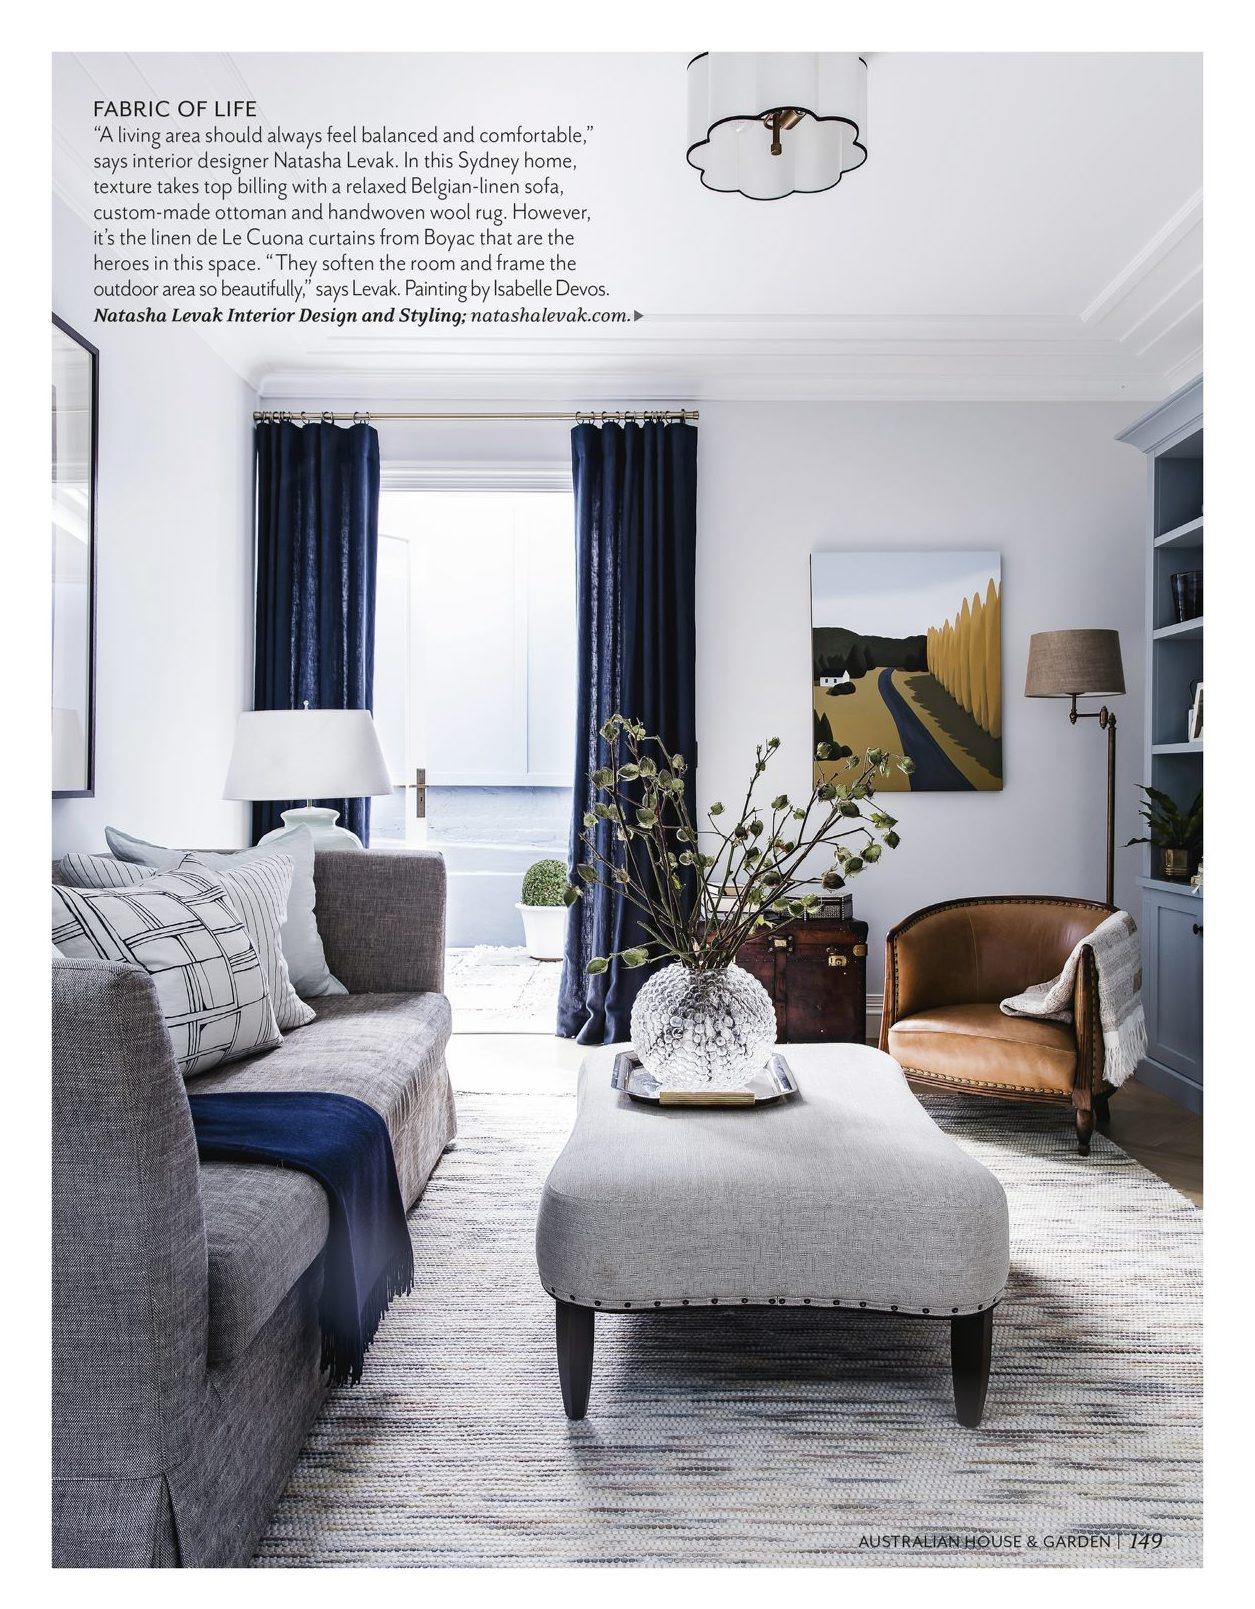 H&G May 2017 p149.jpg